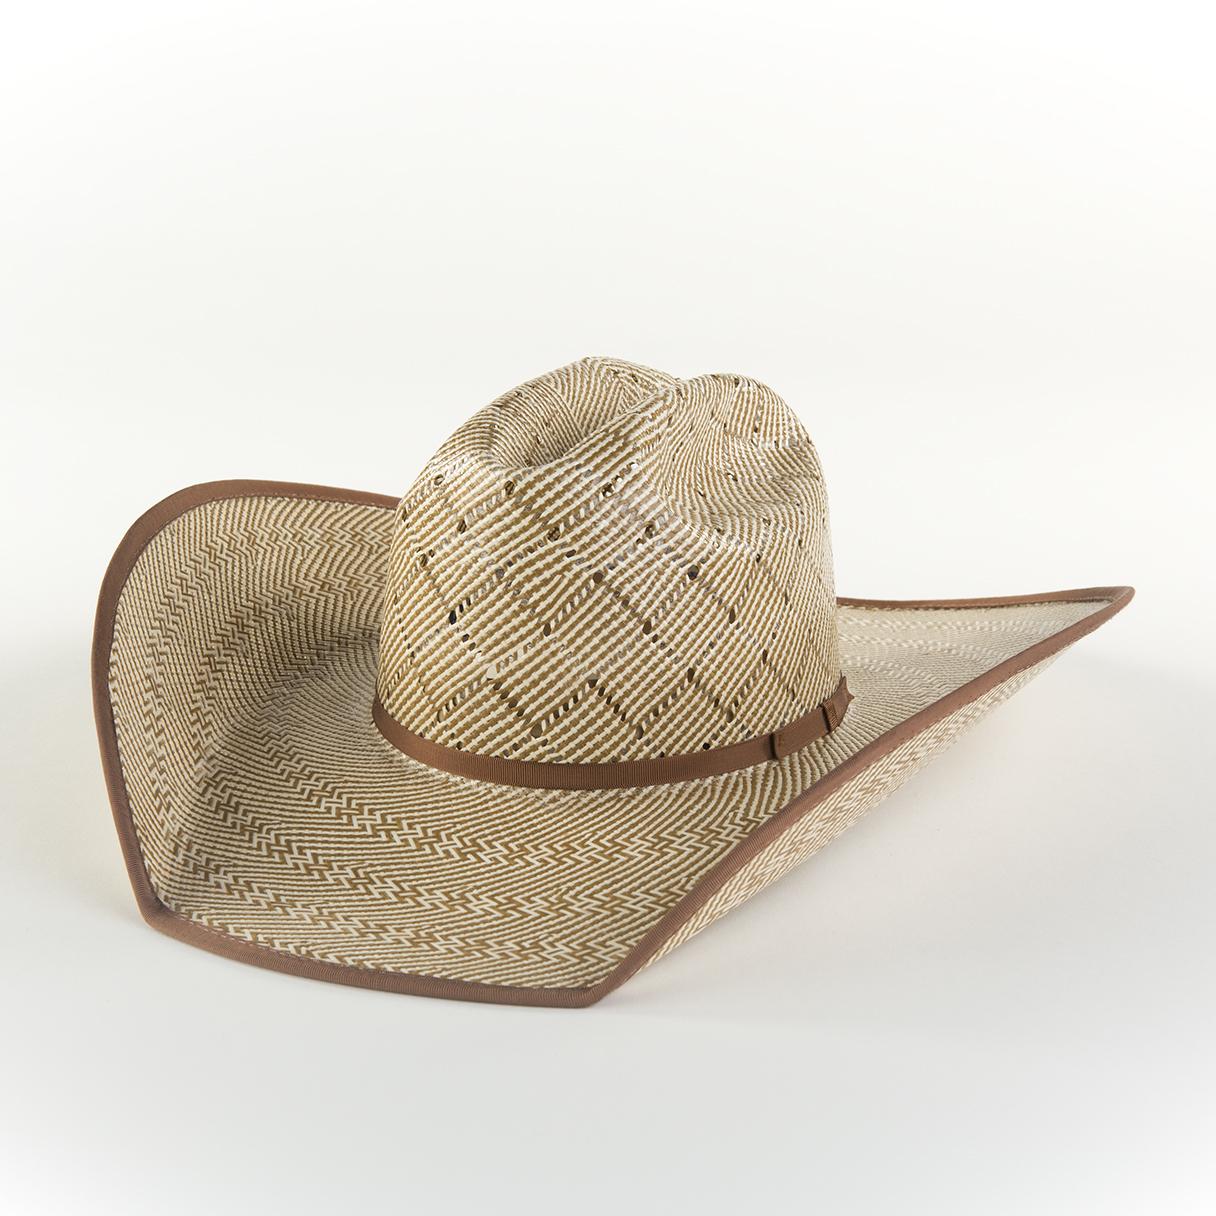 Patchwork Brown - Ivory/Brown Shantung, brim width 3 - 4 1/2 inch.